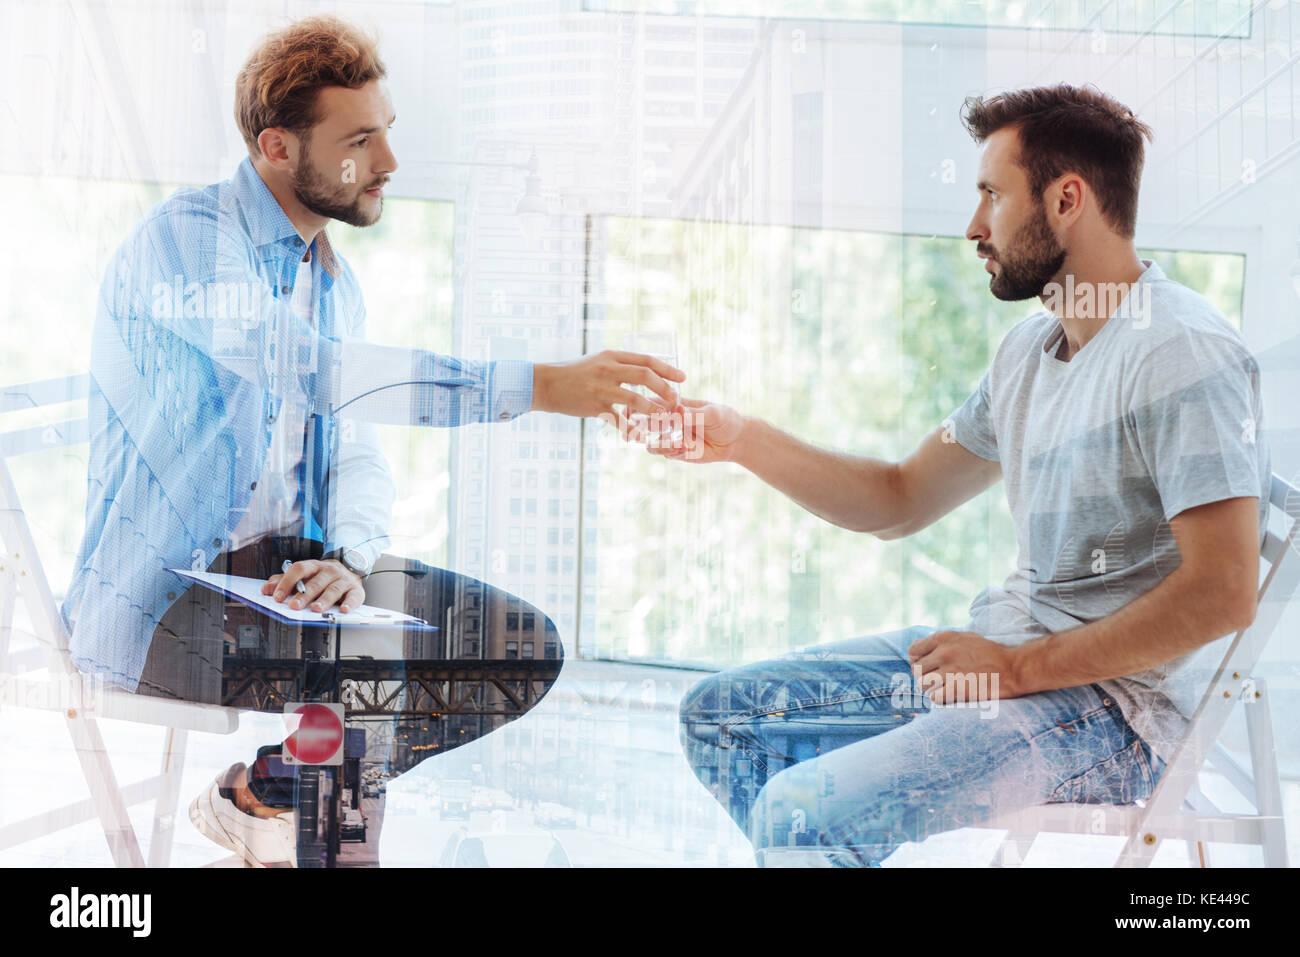 Patient feeling nervous when attending psychiatrist - Stock Image